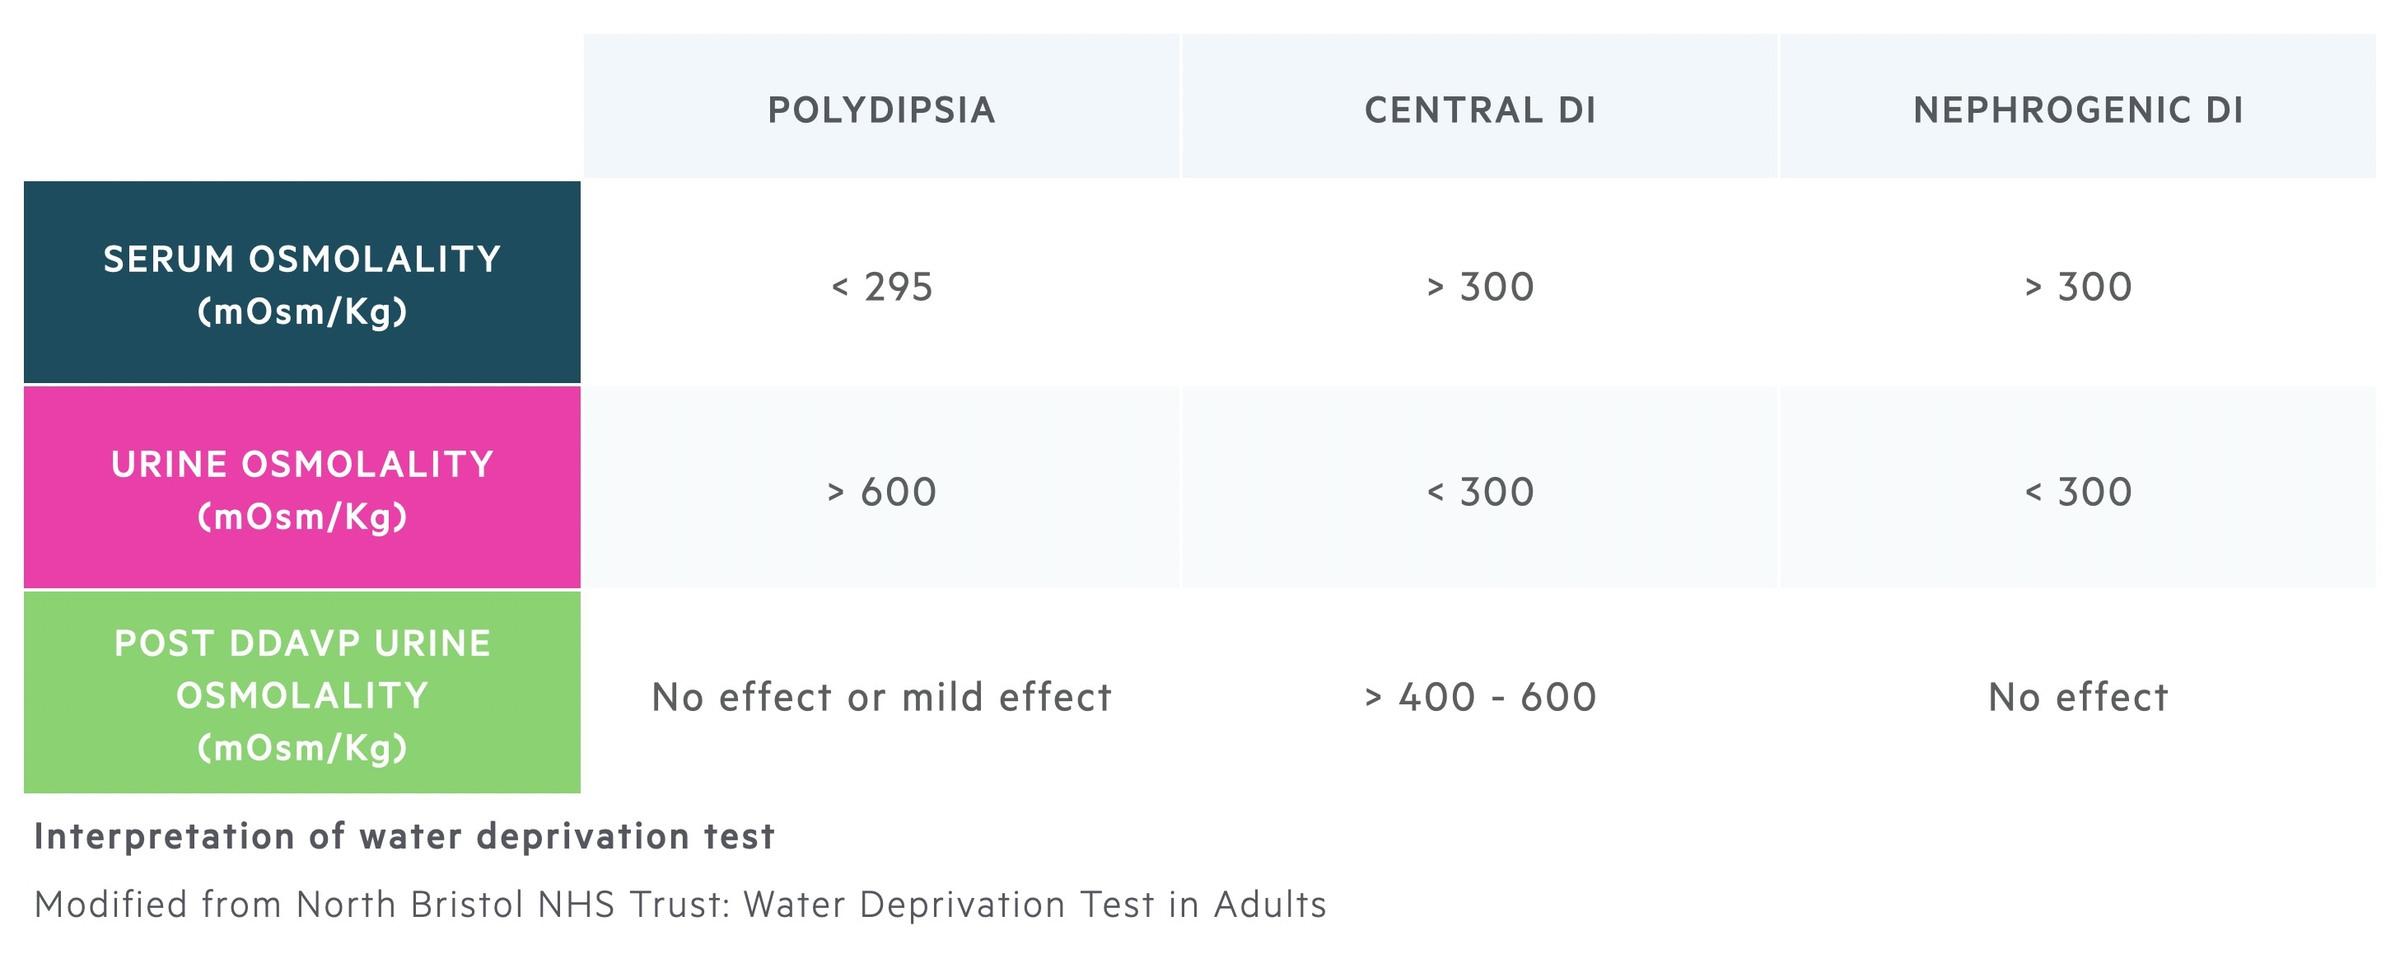 Interpretation of water deprivation test